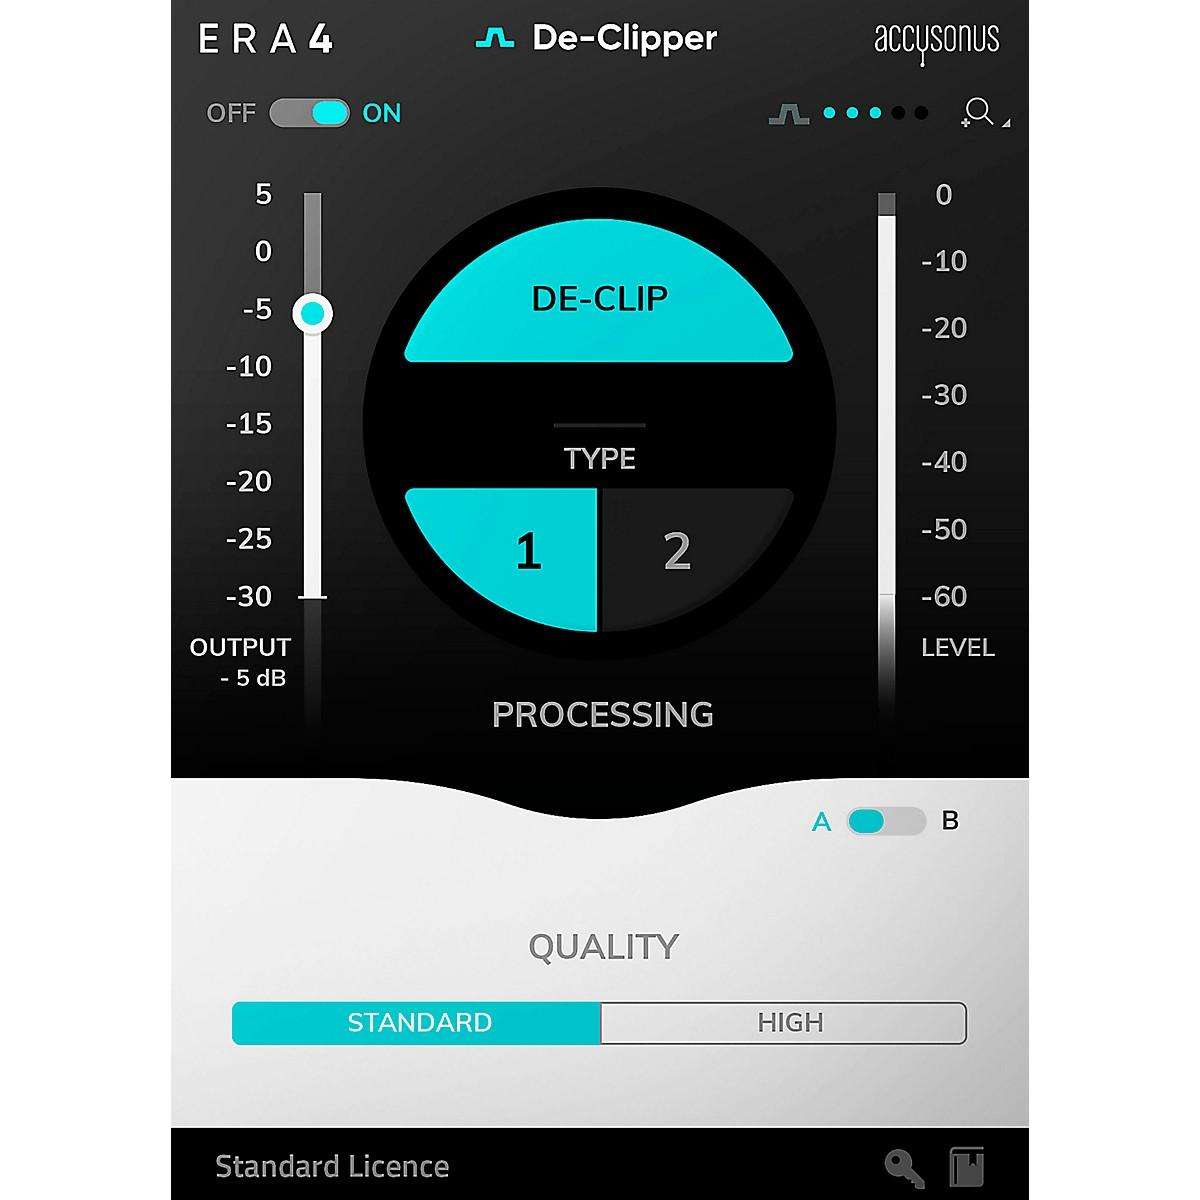 Accusonus ERA De-Clipper